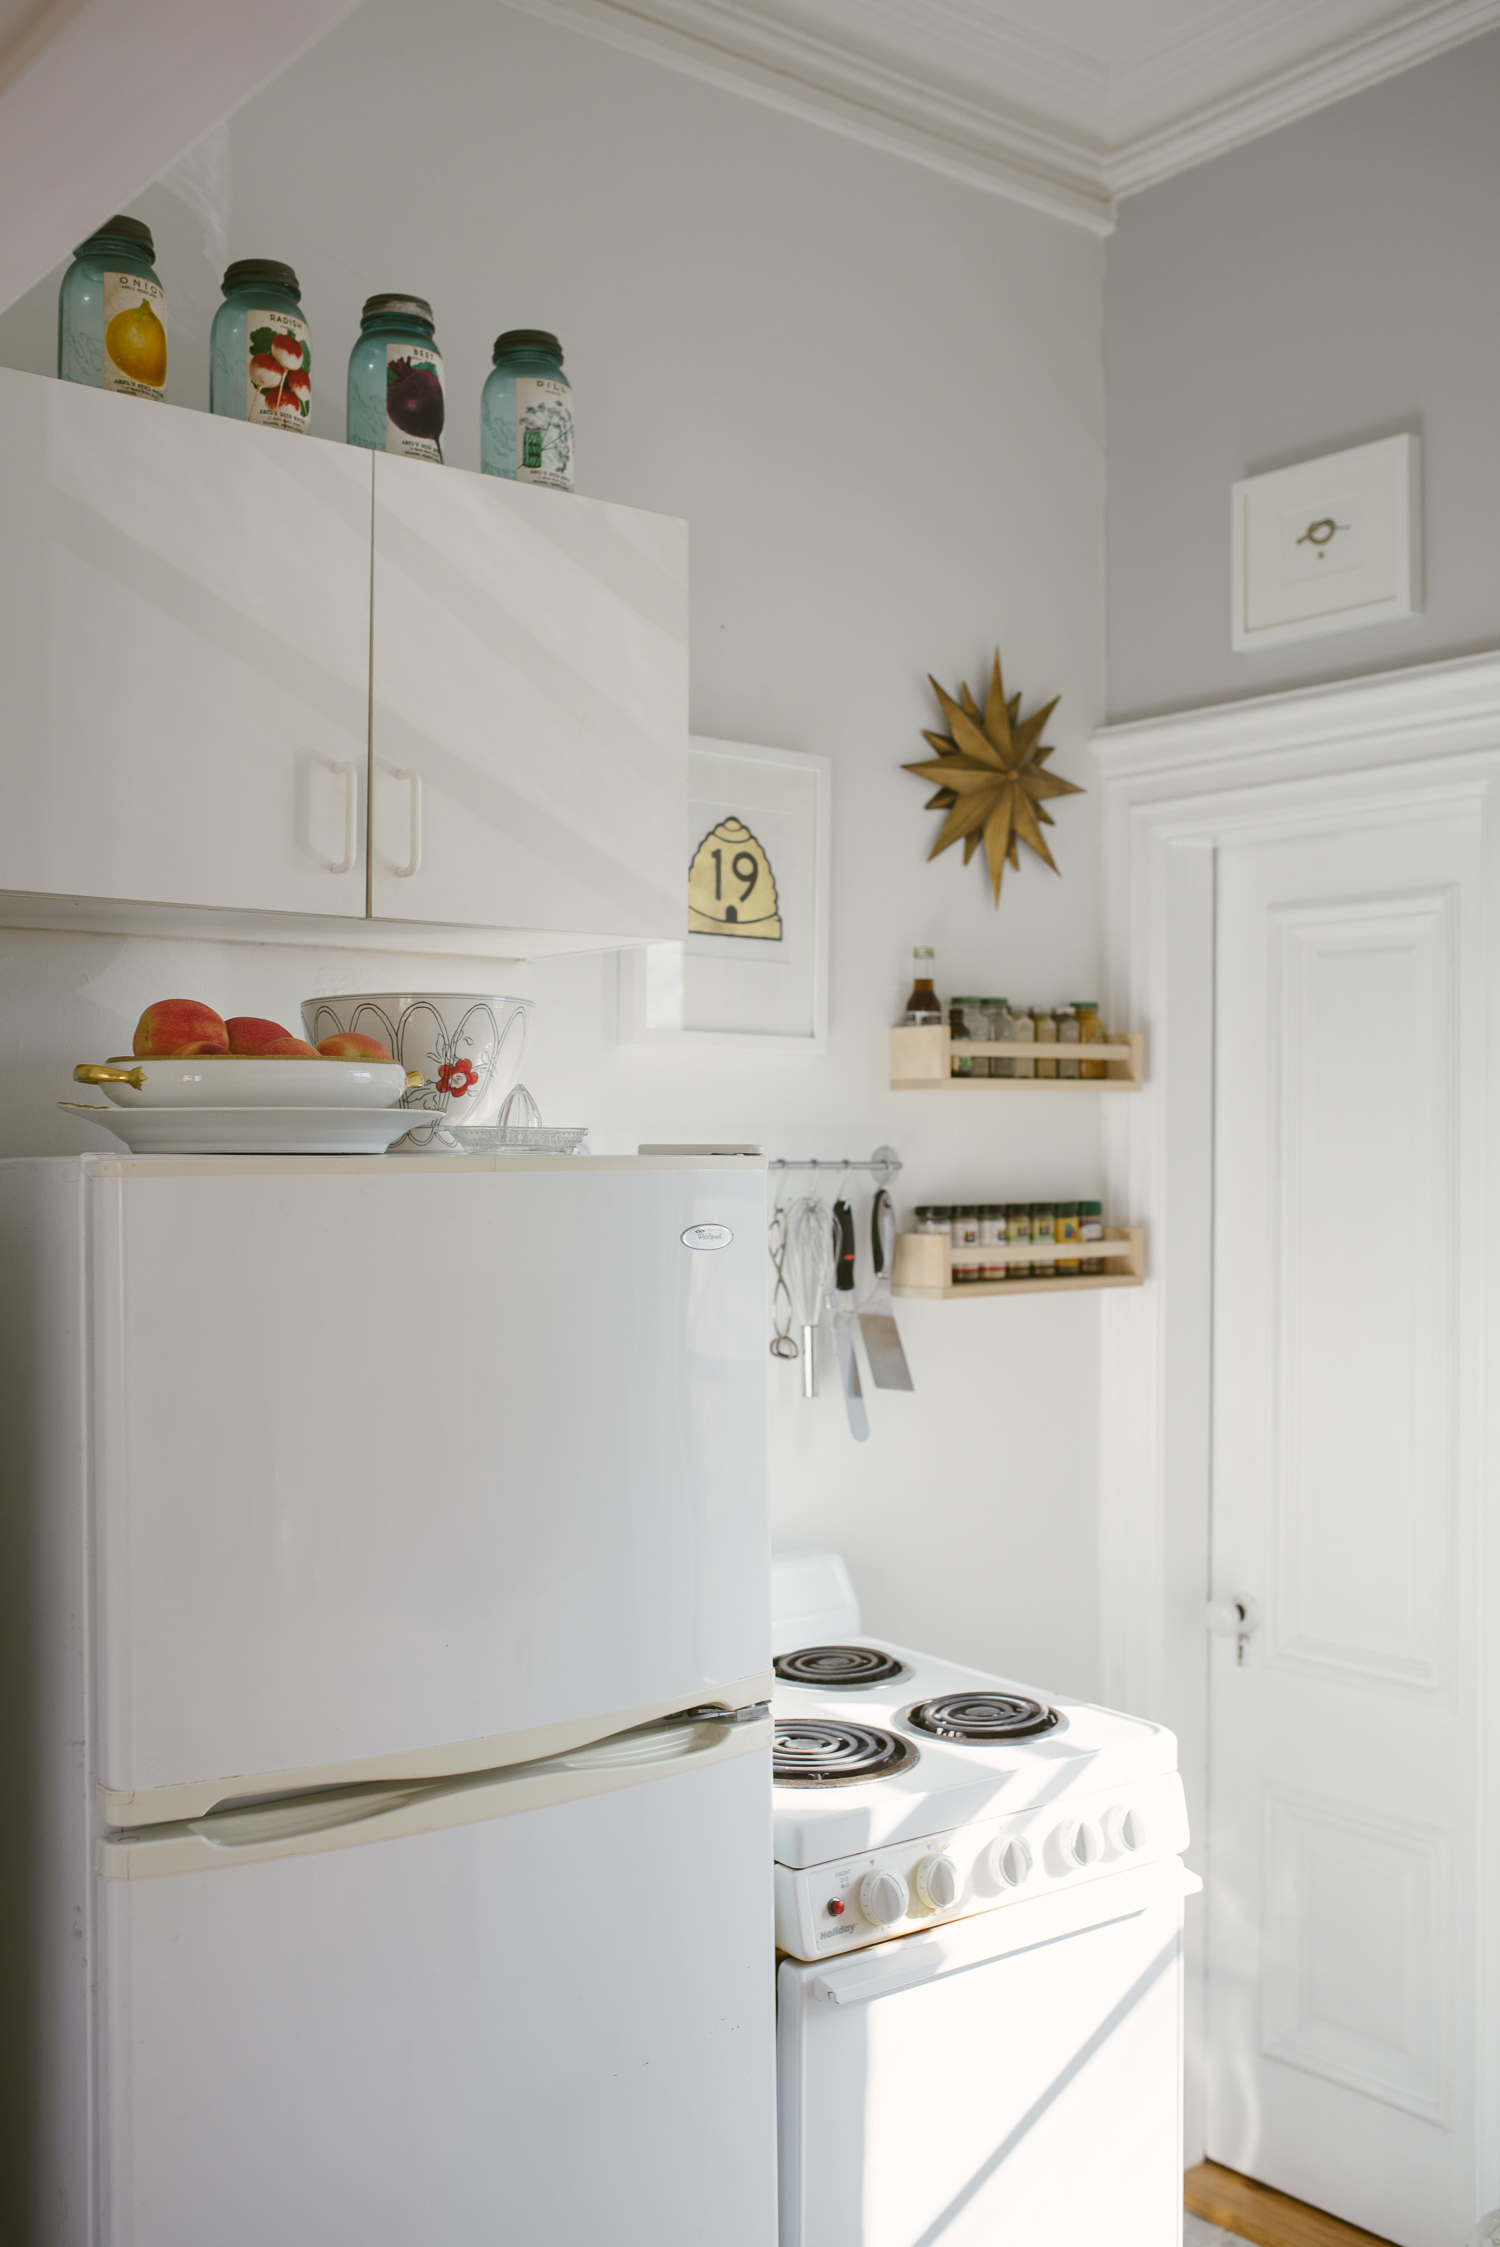 kelly_knapp_kitchen_04.jpg